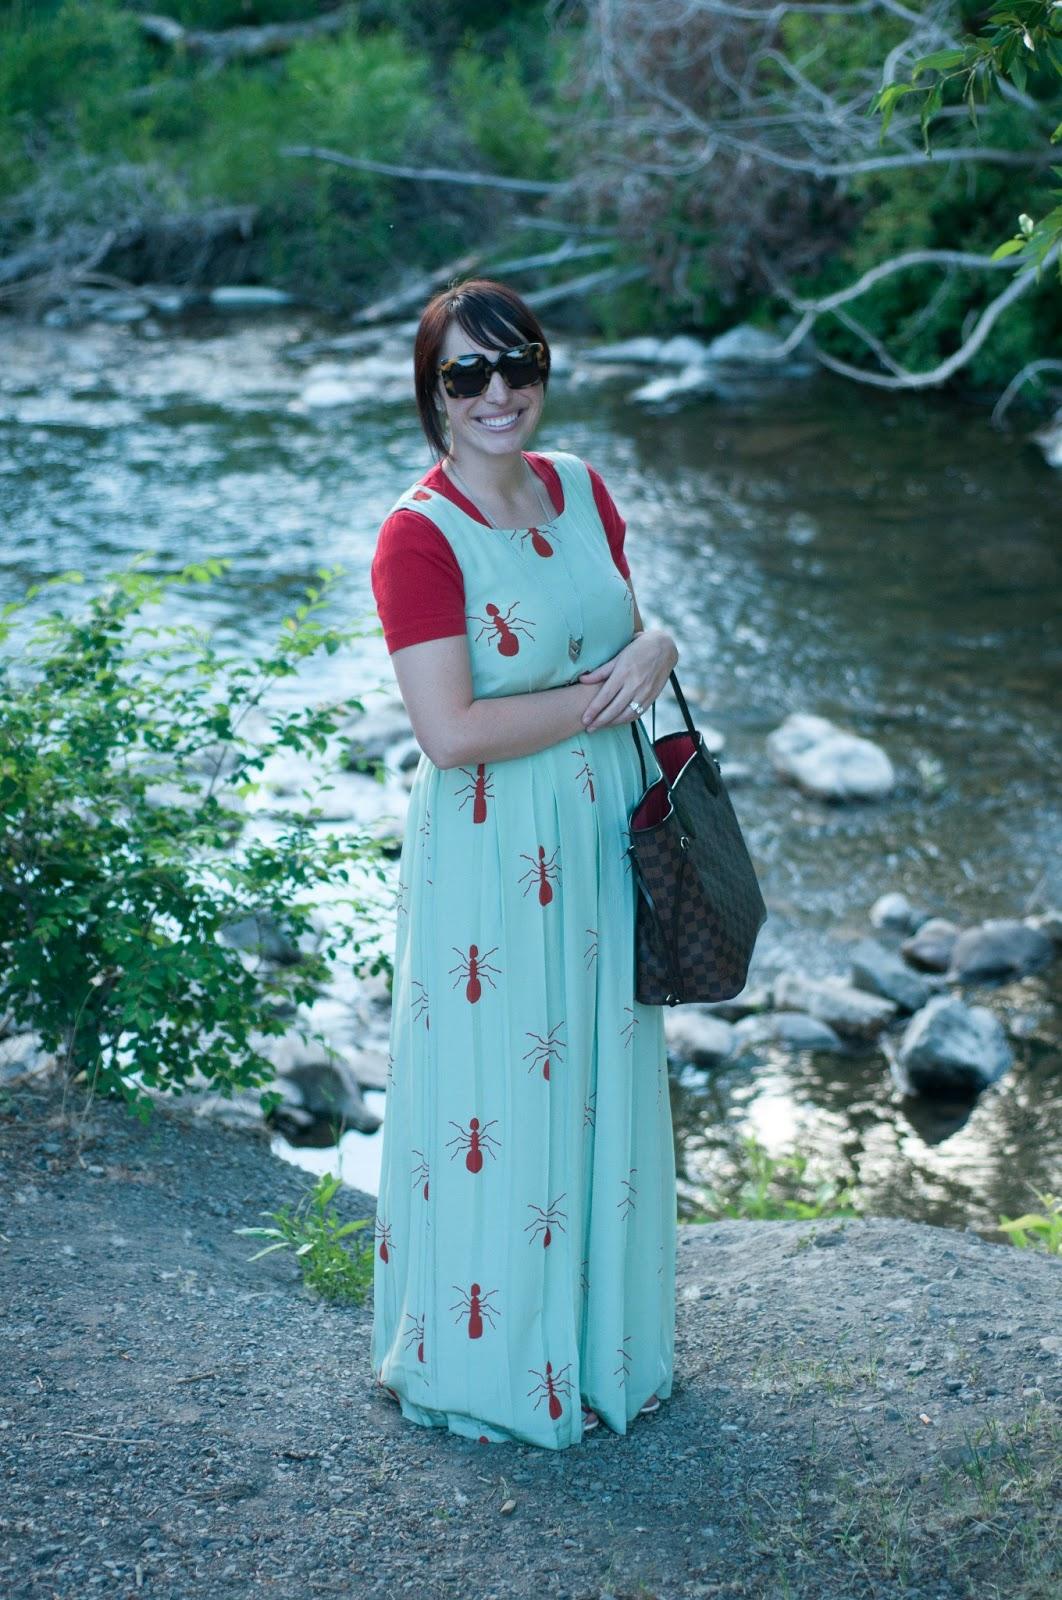 fashion blog, style blog, charlotte taylor, Rebecca minkoff, karen walker sunglasses, anthropologie, ootd